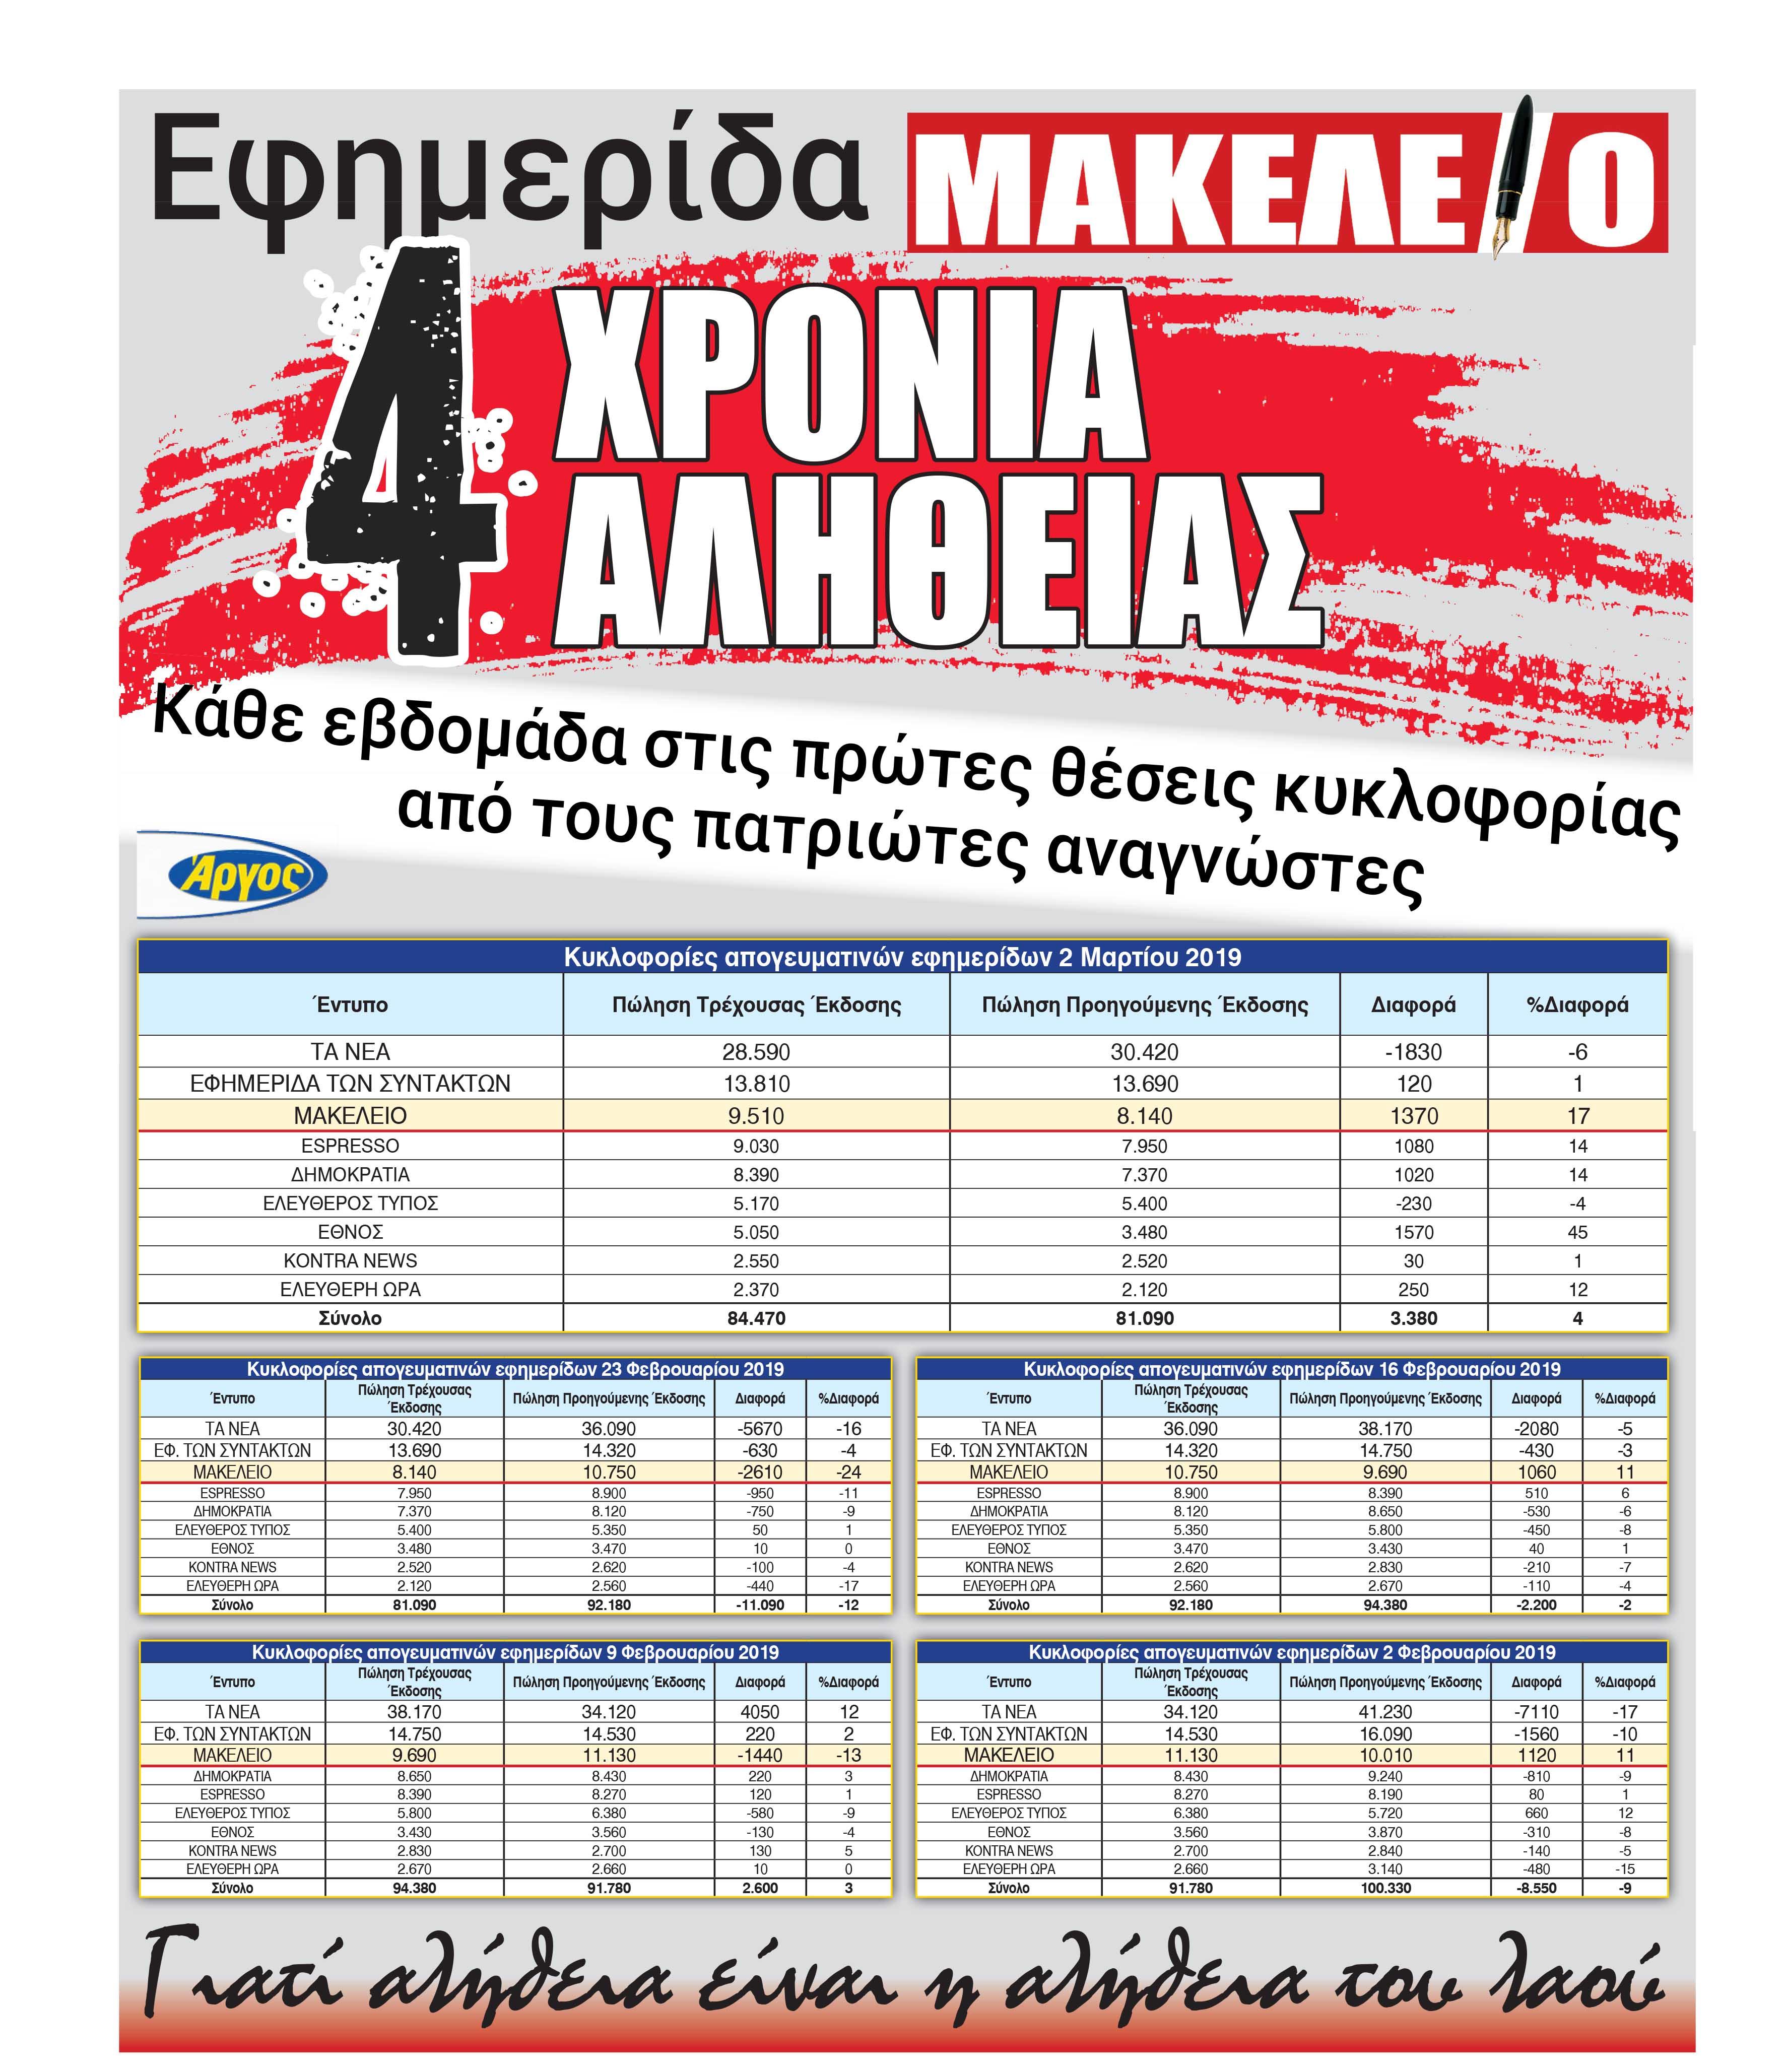 24_4xr makeleio new.indd